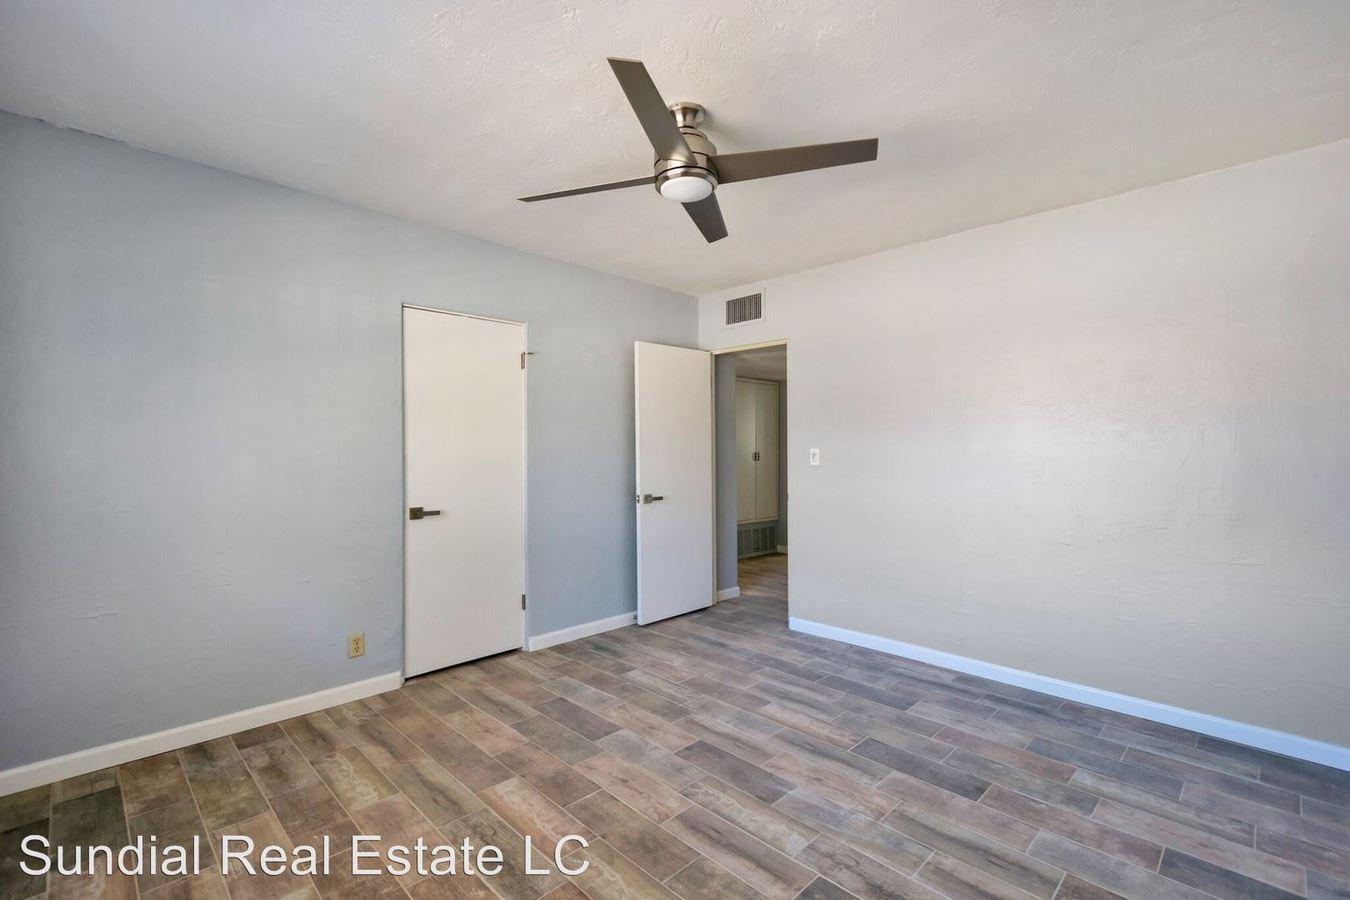 2 Bedrooms 1 Bathroom Apartment for rent at 544 & 546 West San Juan Avenue in Phoenix, AZ